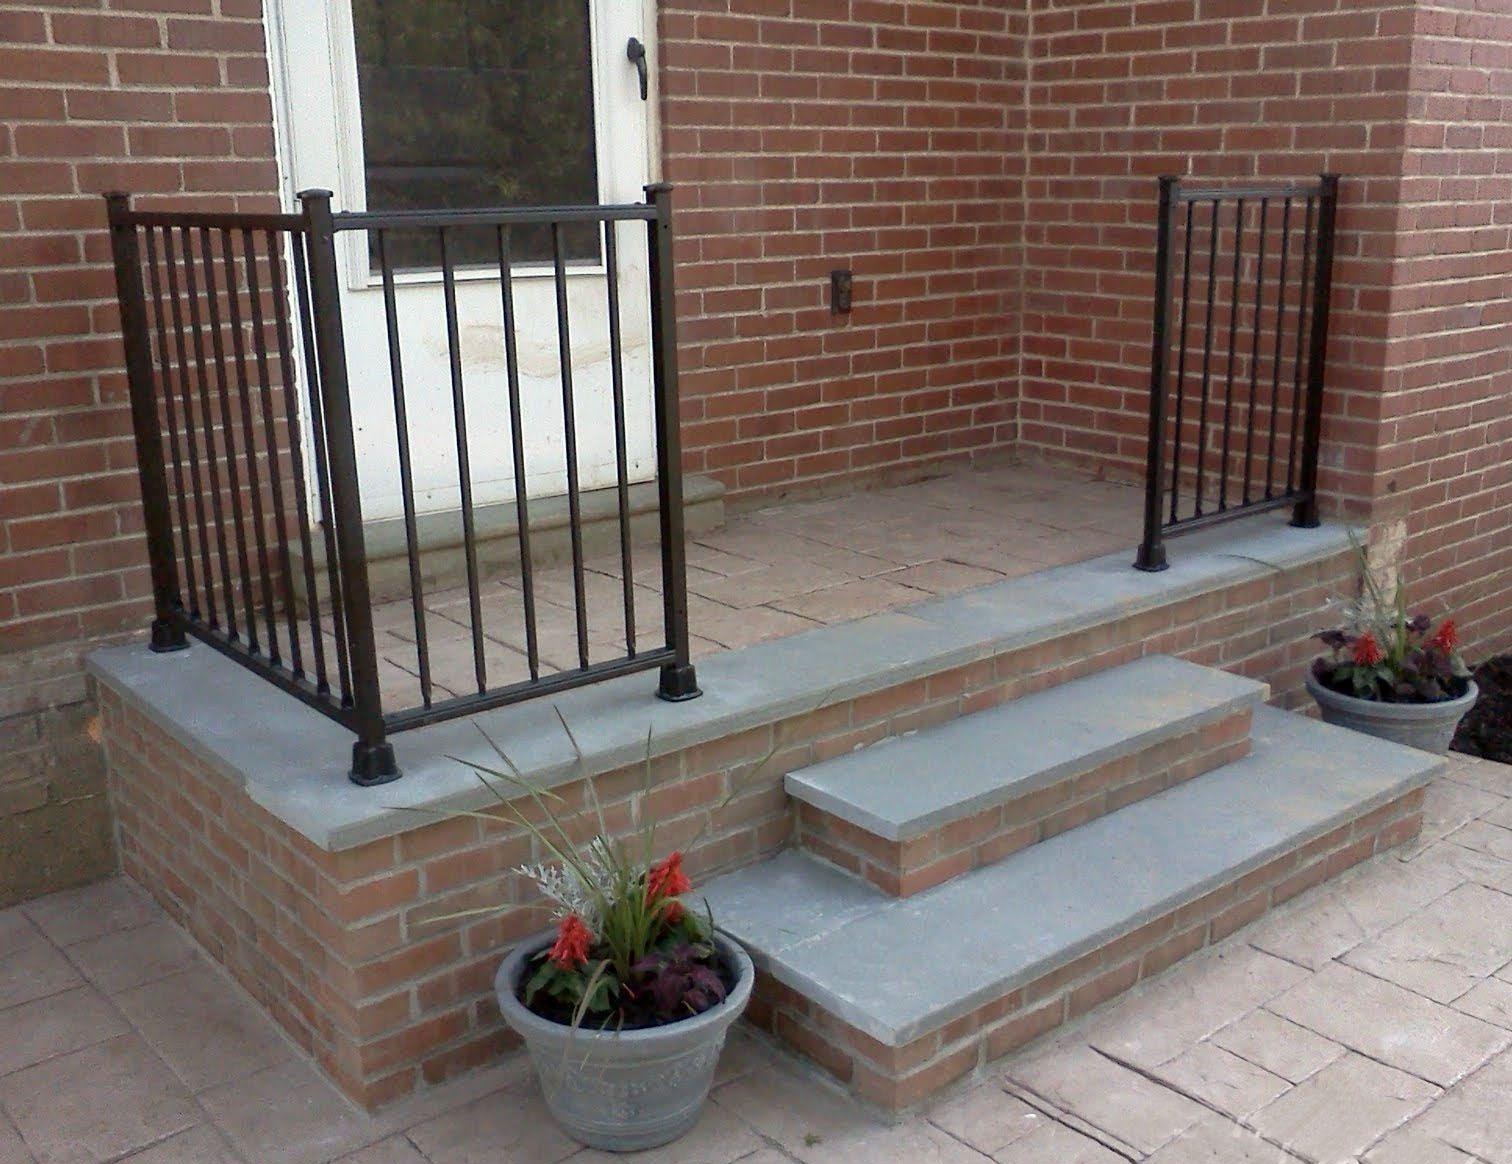 Steps Combination Between PA Bluestone Treads, Stamped Concrete Landing And  Veneer Brick Risers